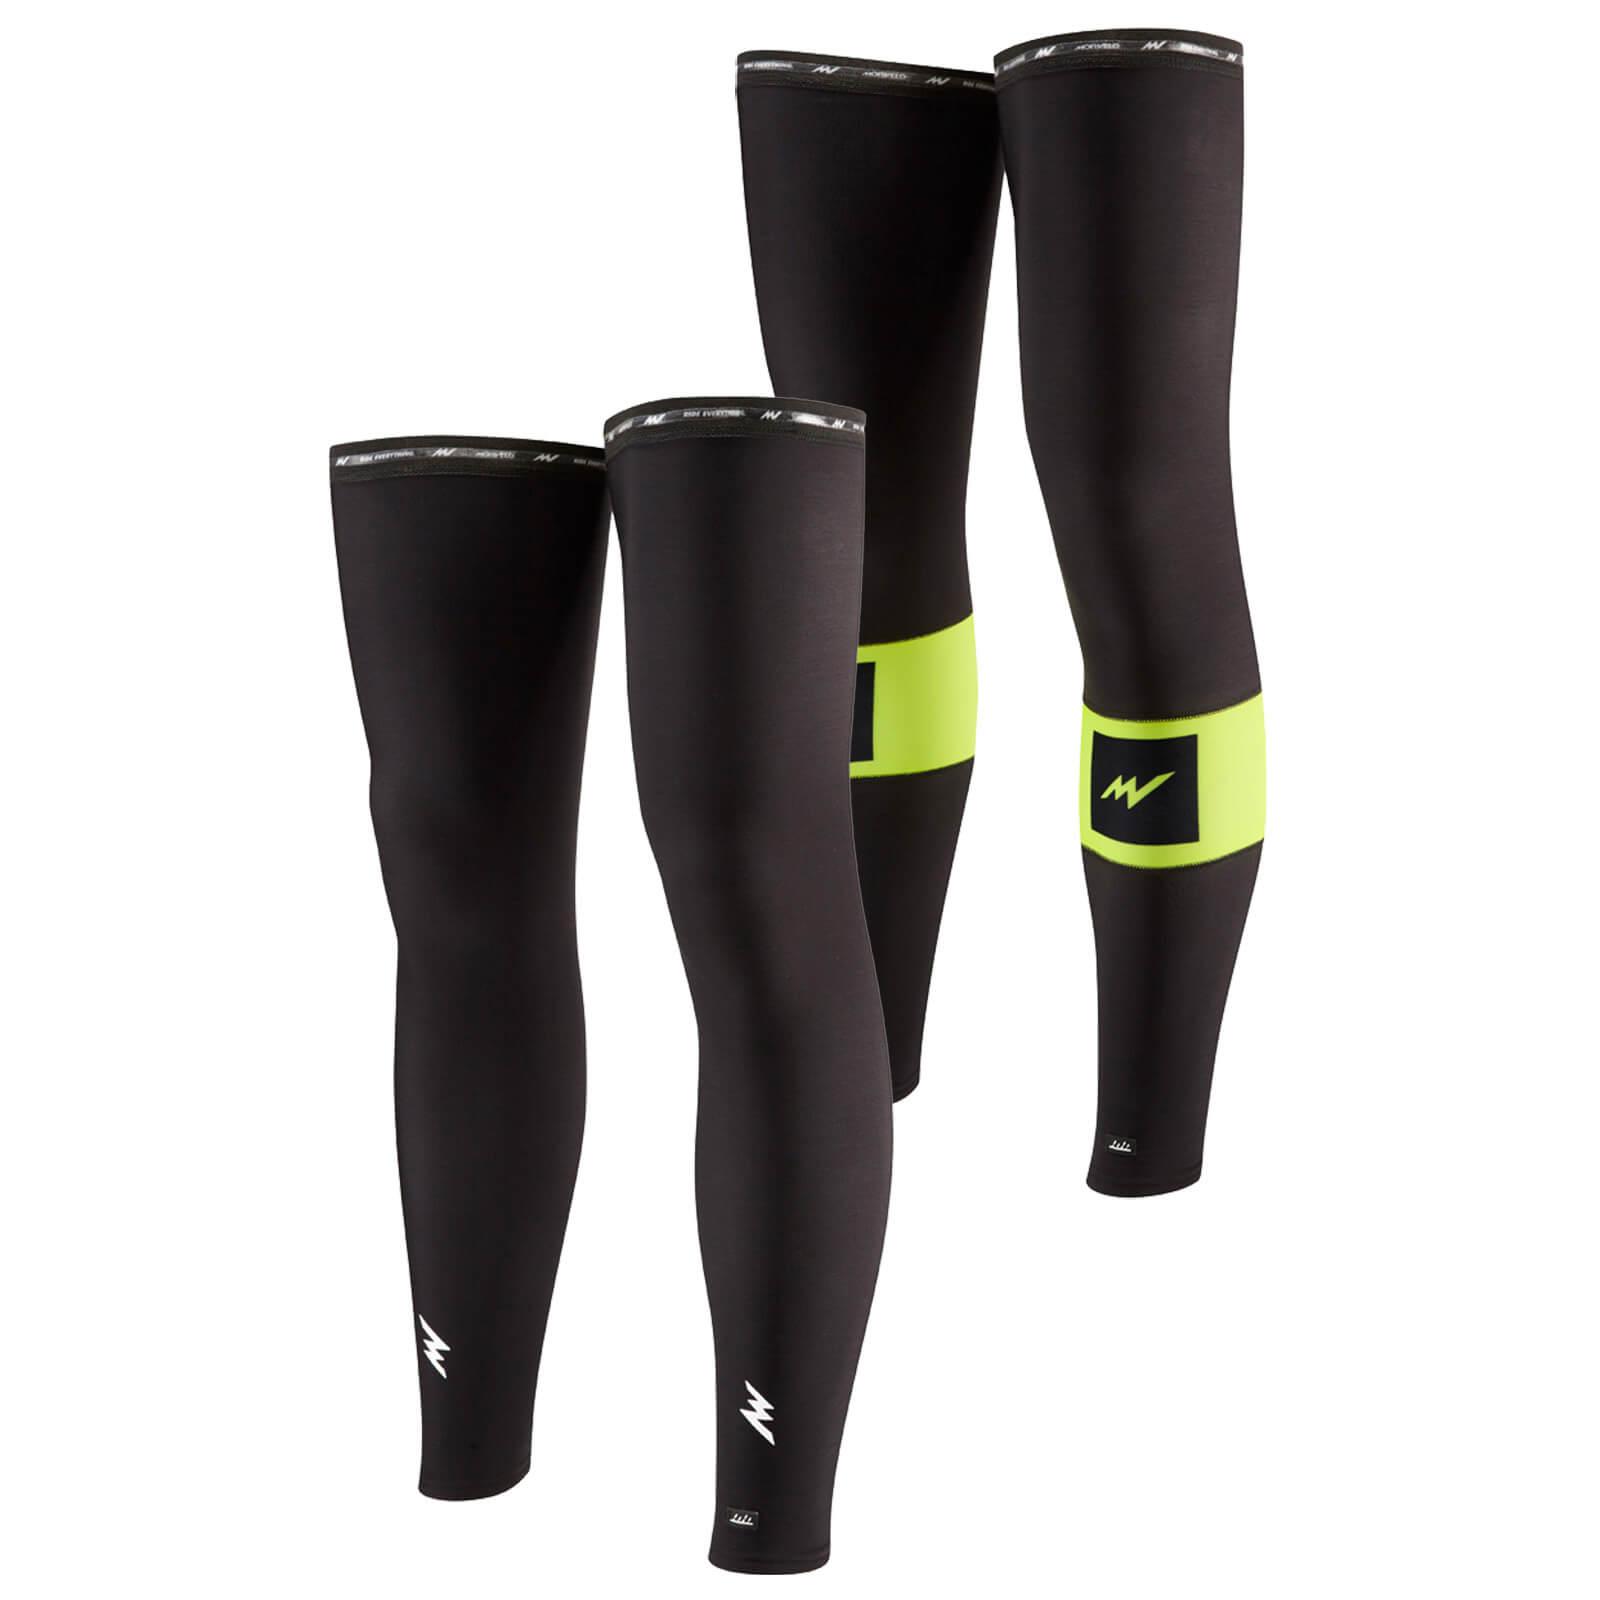 Morvelo StormShield Leg Warmers | Arm- og benvarmere